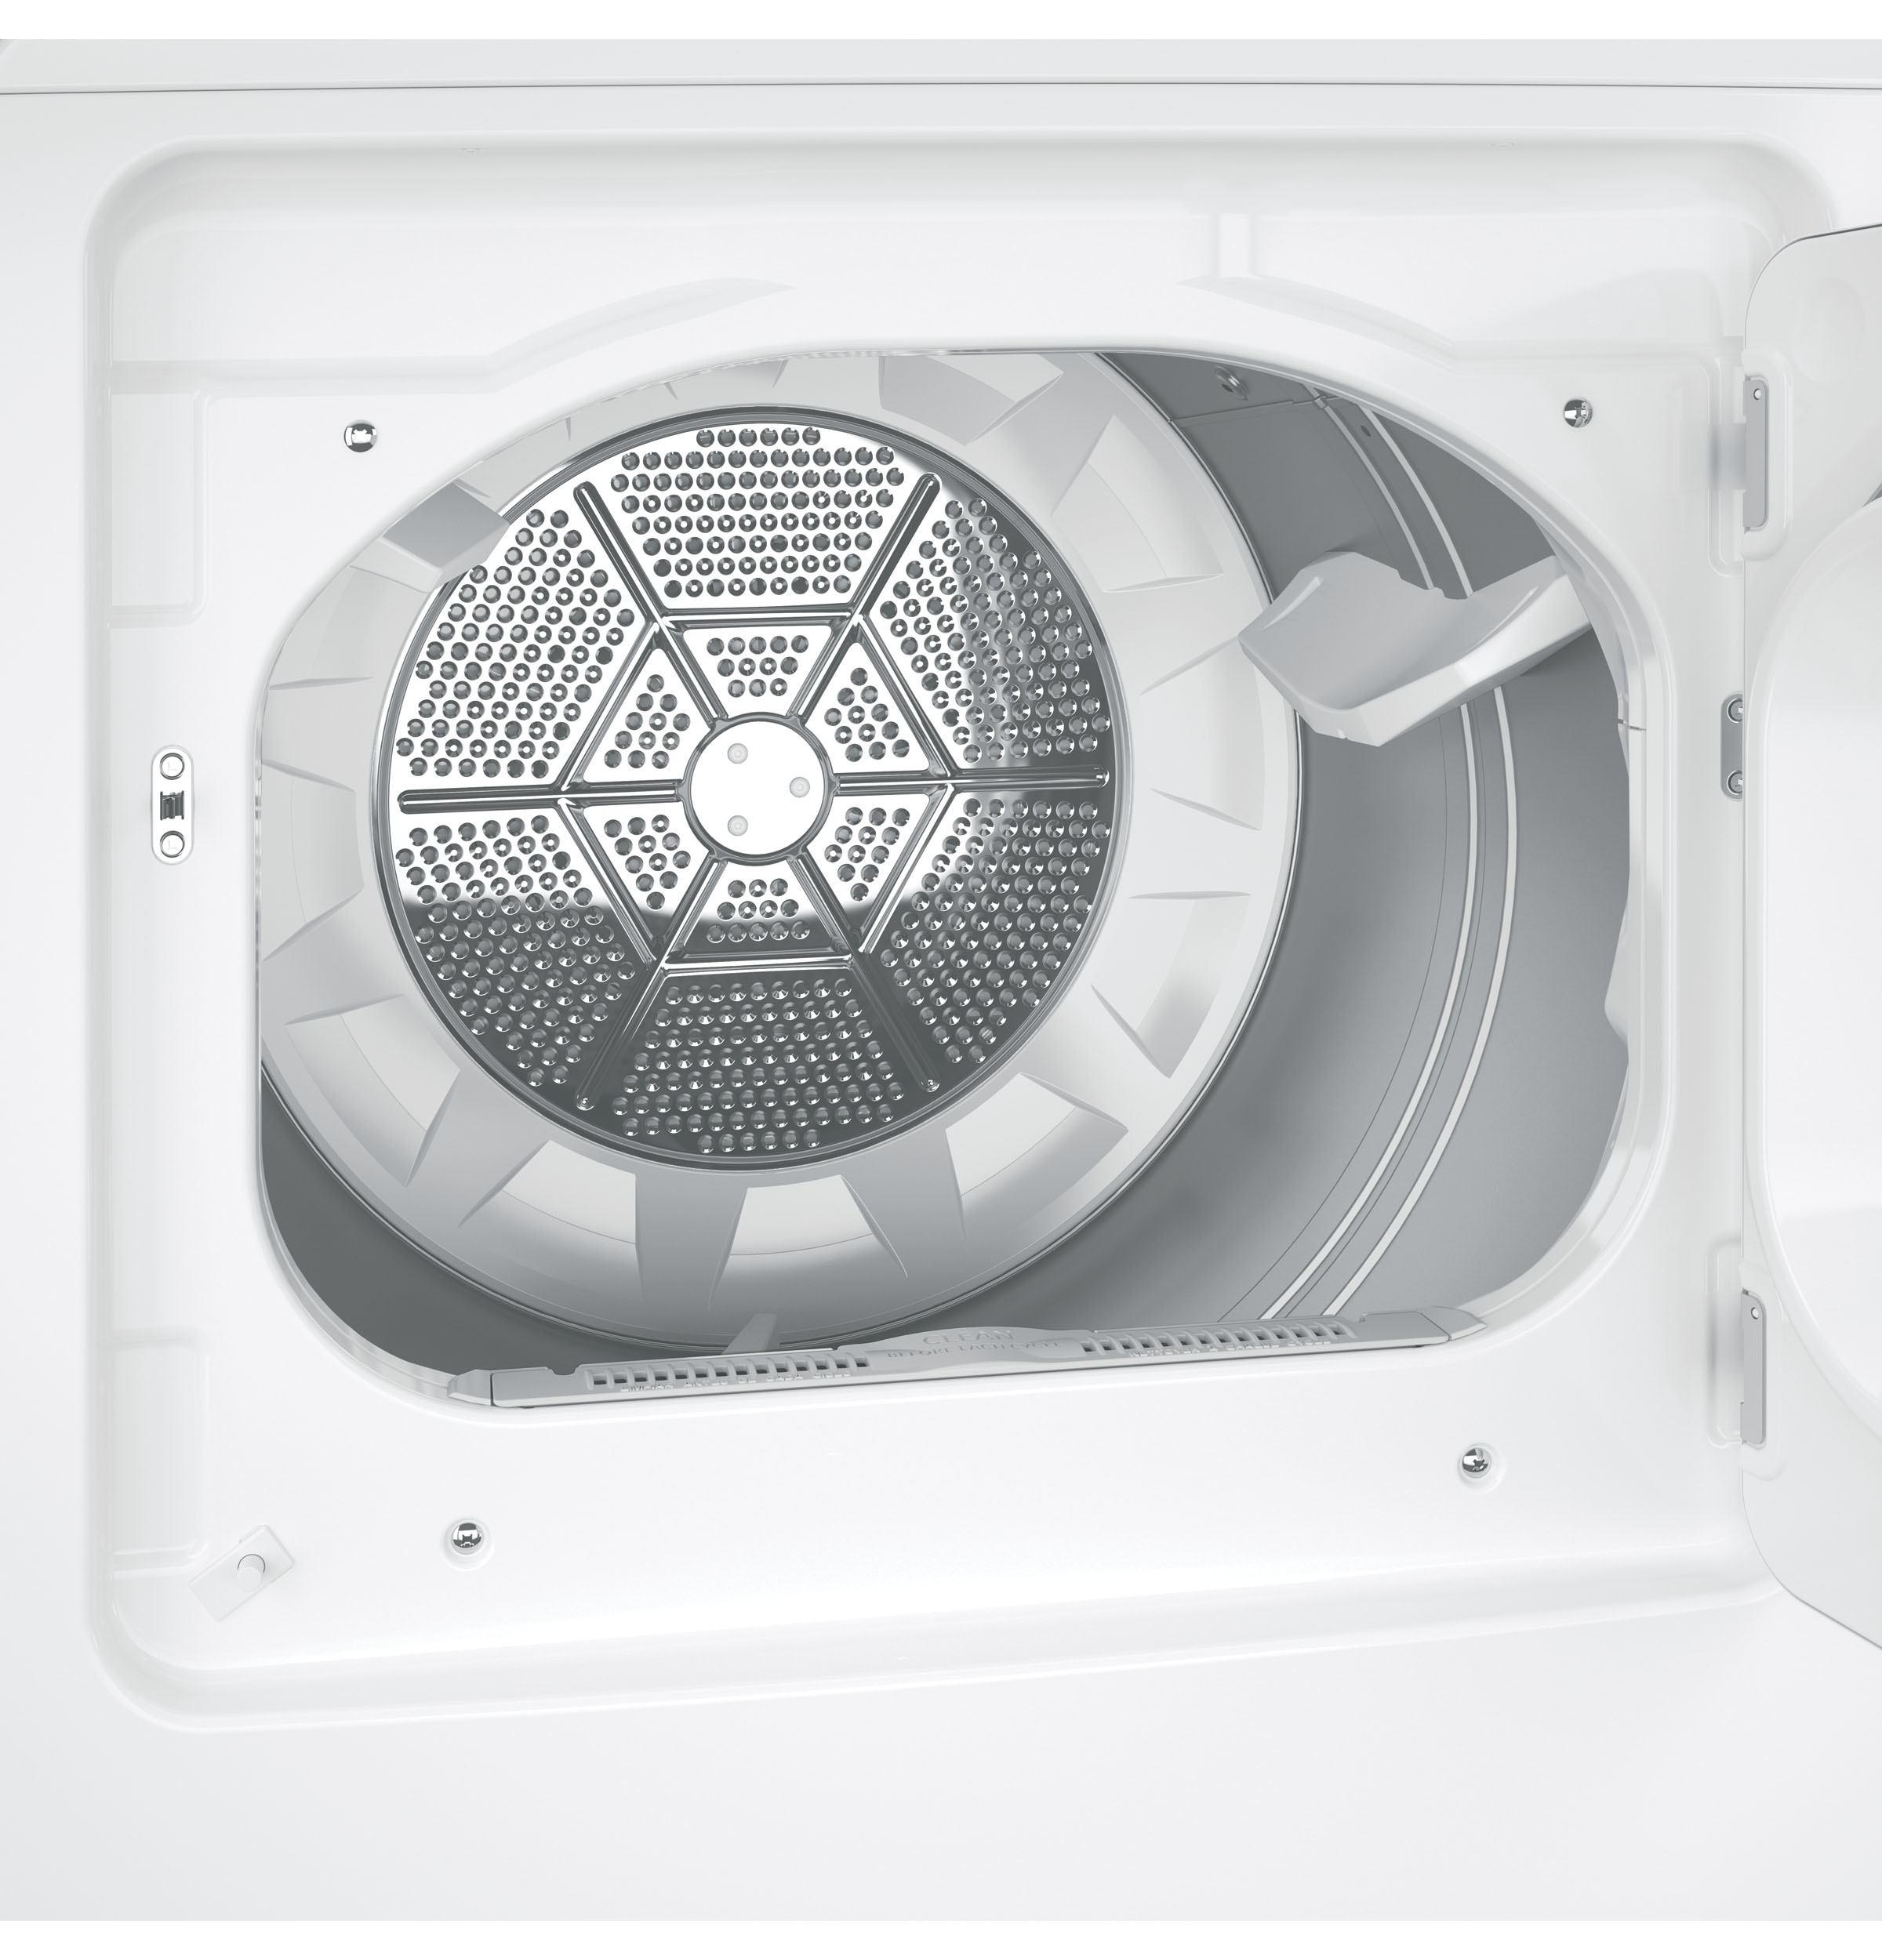 GE Appliances GTX65EBSJWS 6.1 cu. ft. Aluminized Alloy Drum Electric Dryer w/ HE Sensor Dry - White